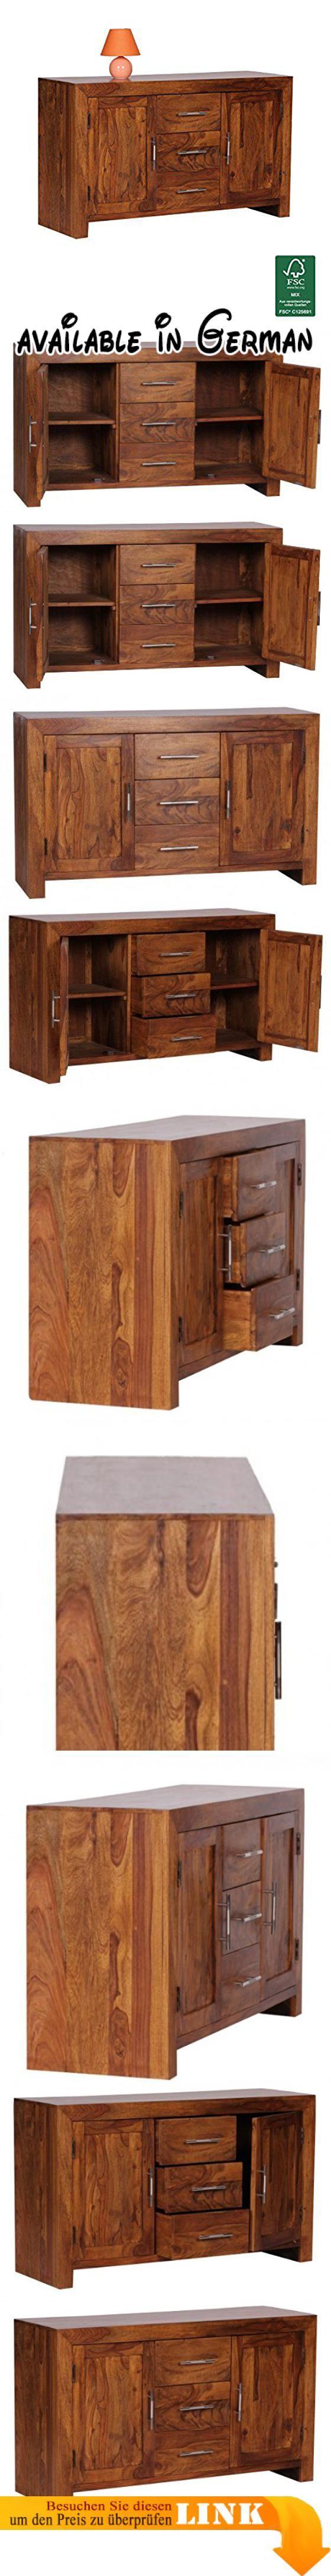 B00GCU4B5C : FineBuy Sideboard Massivholz Sheesham Kommode 118 Cm 3  Schubladen 2 Türen Design Highboard Landhaus Stil Braun Natur Echt Holz ...